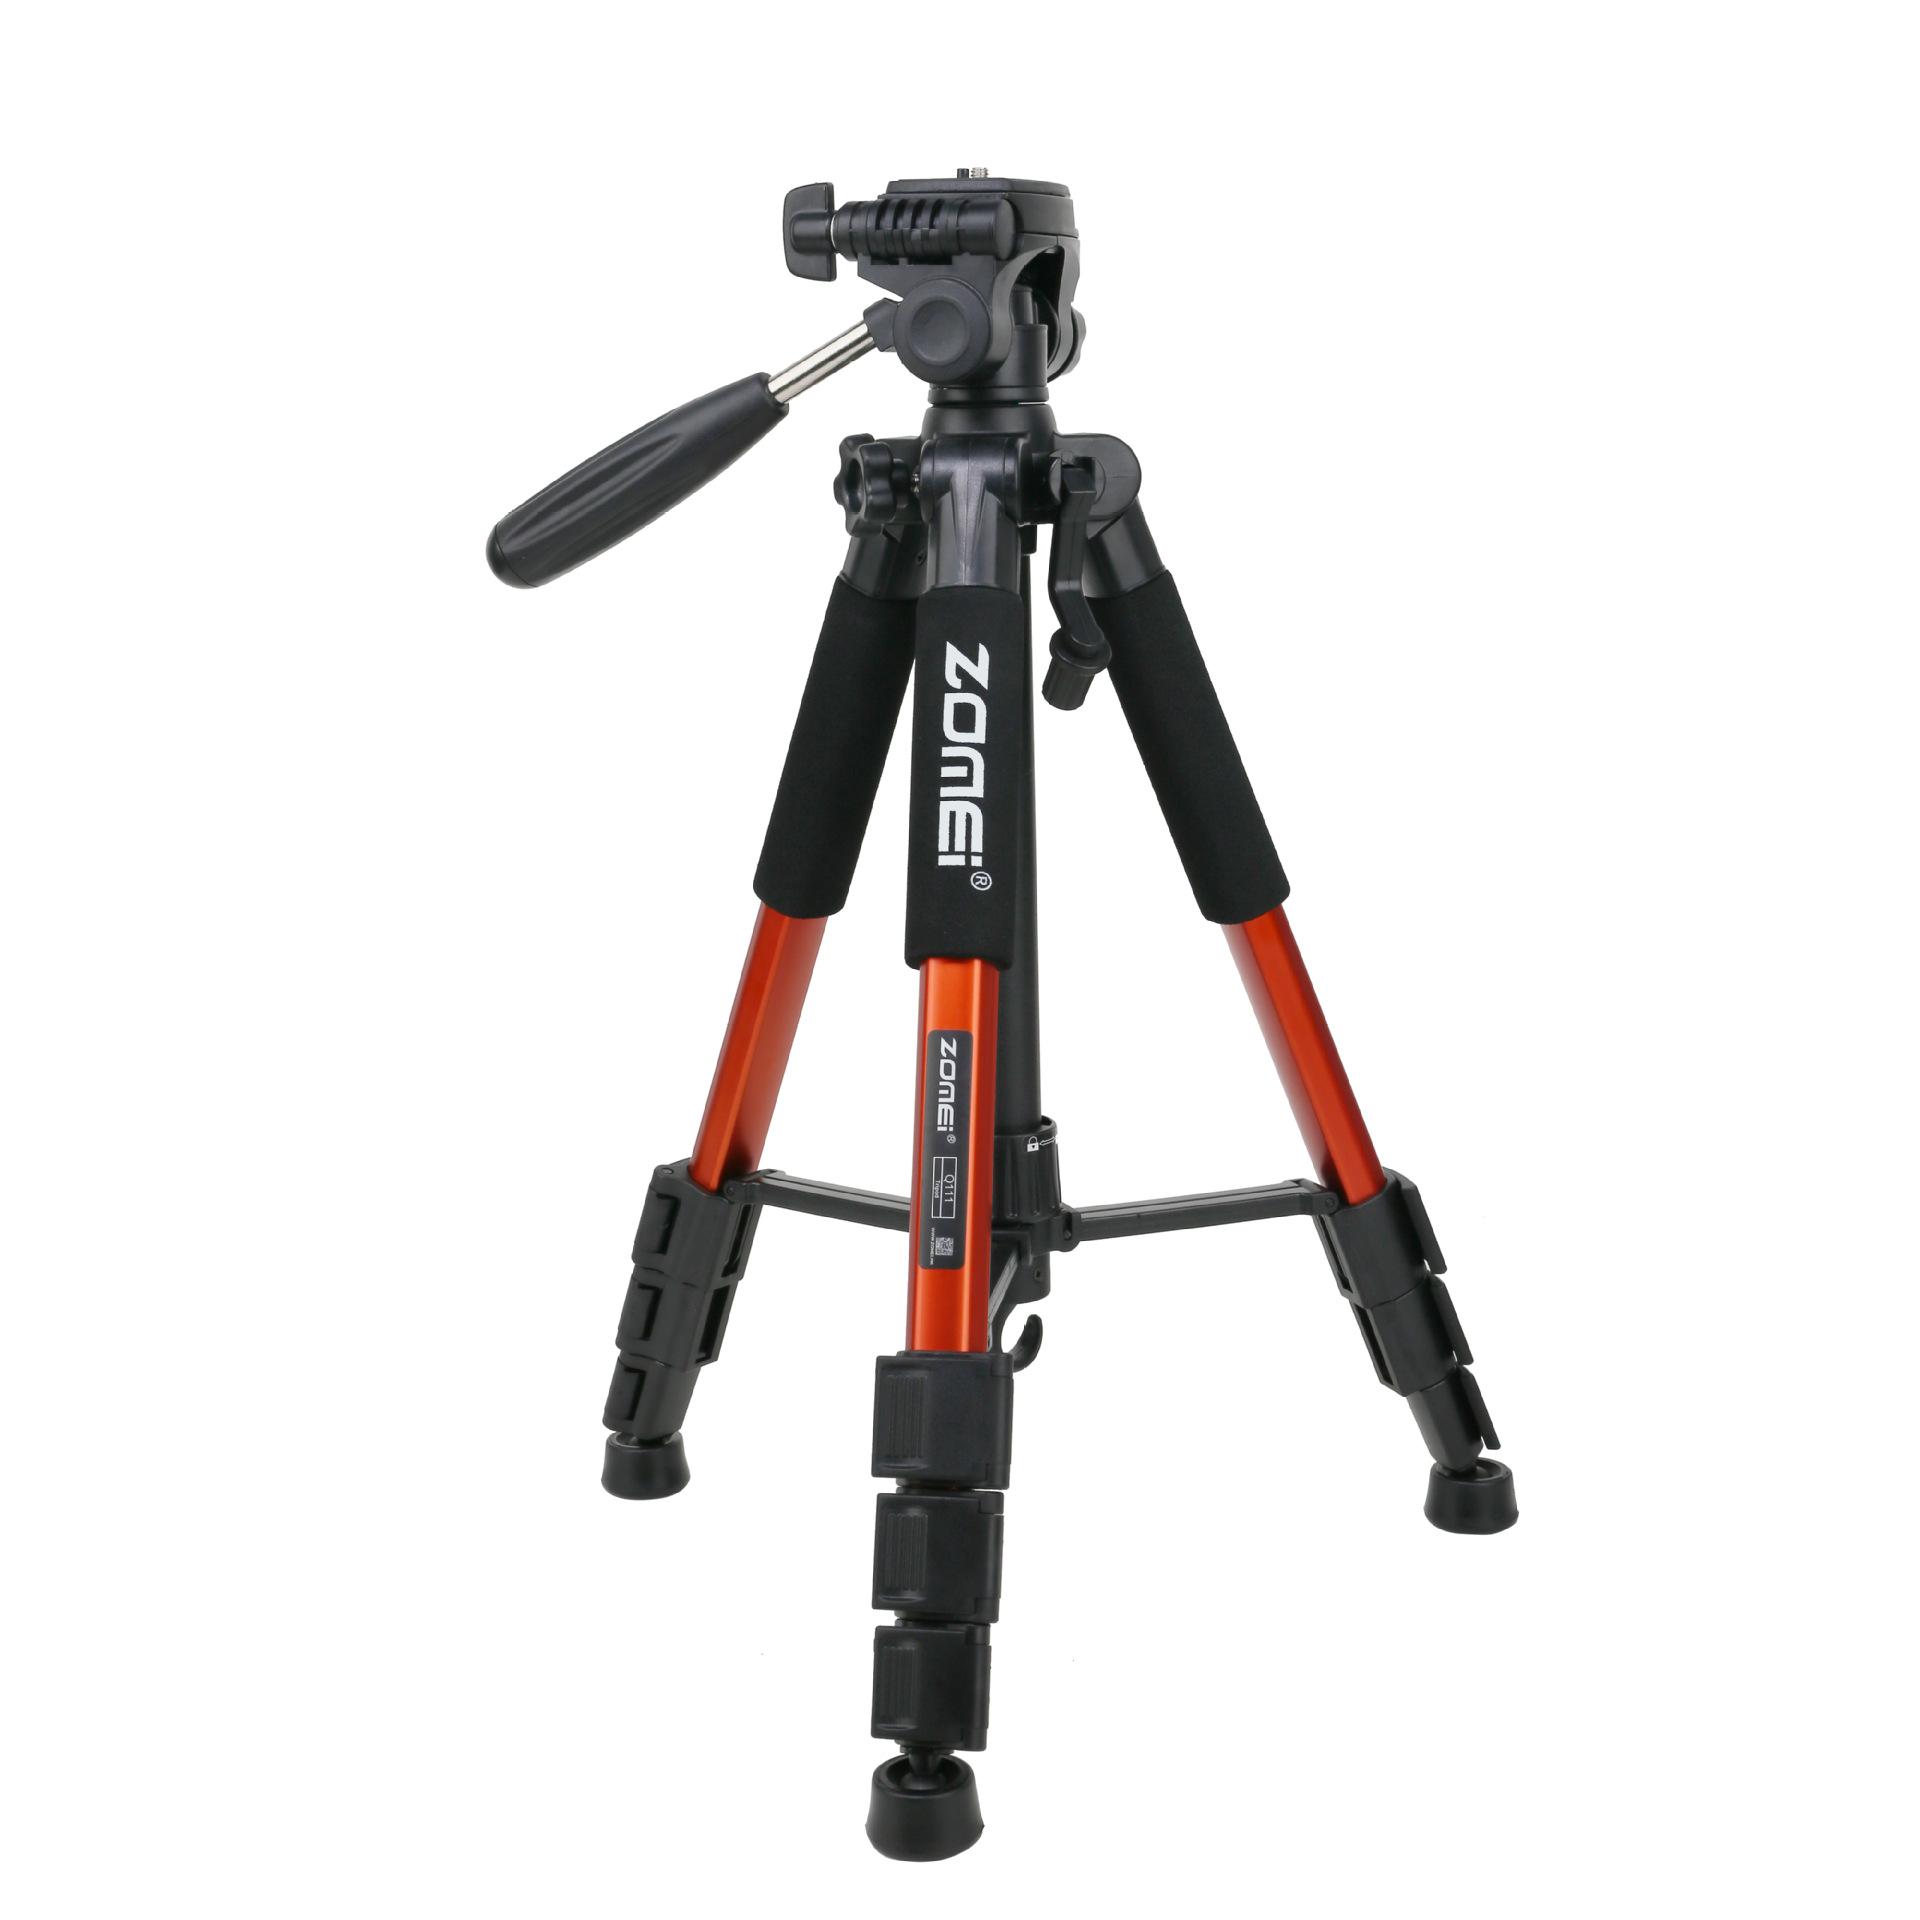 Mobile Phone Bracket Pro Aluminium Q111 Tripod for DSLR Camera Video Fill-in Light Bracket Orange